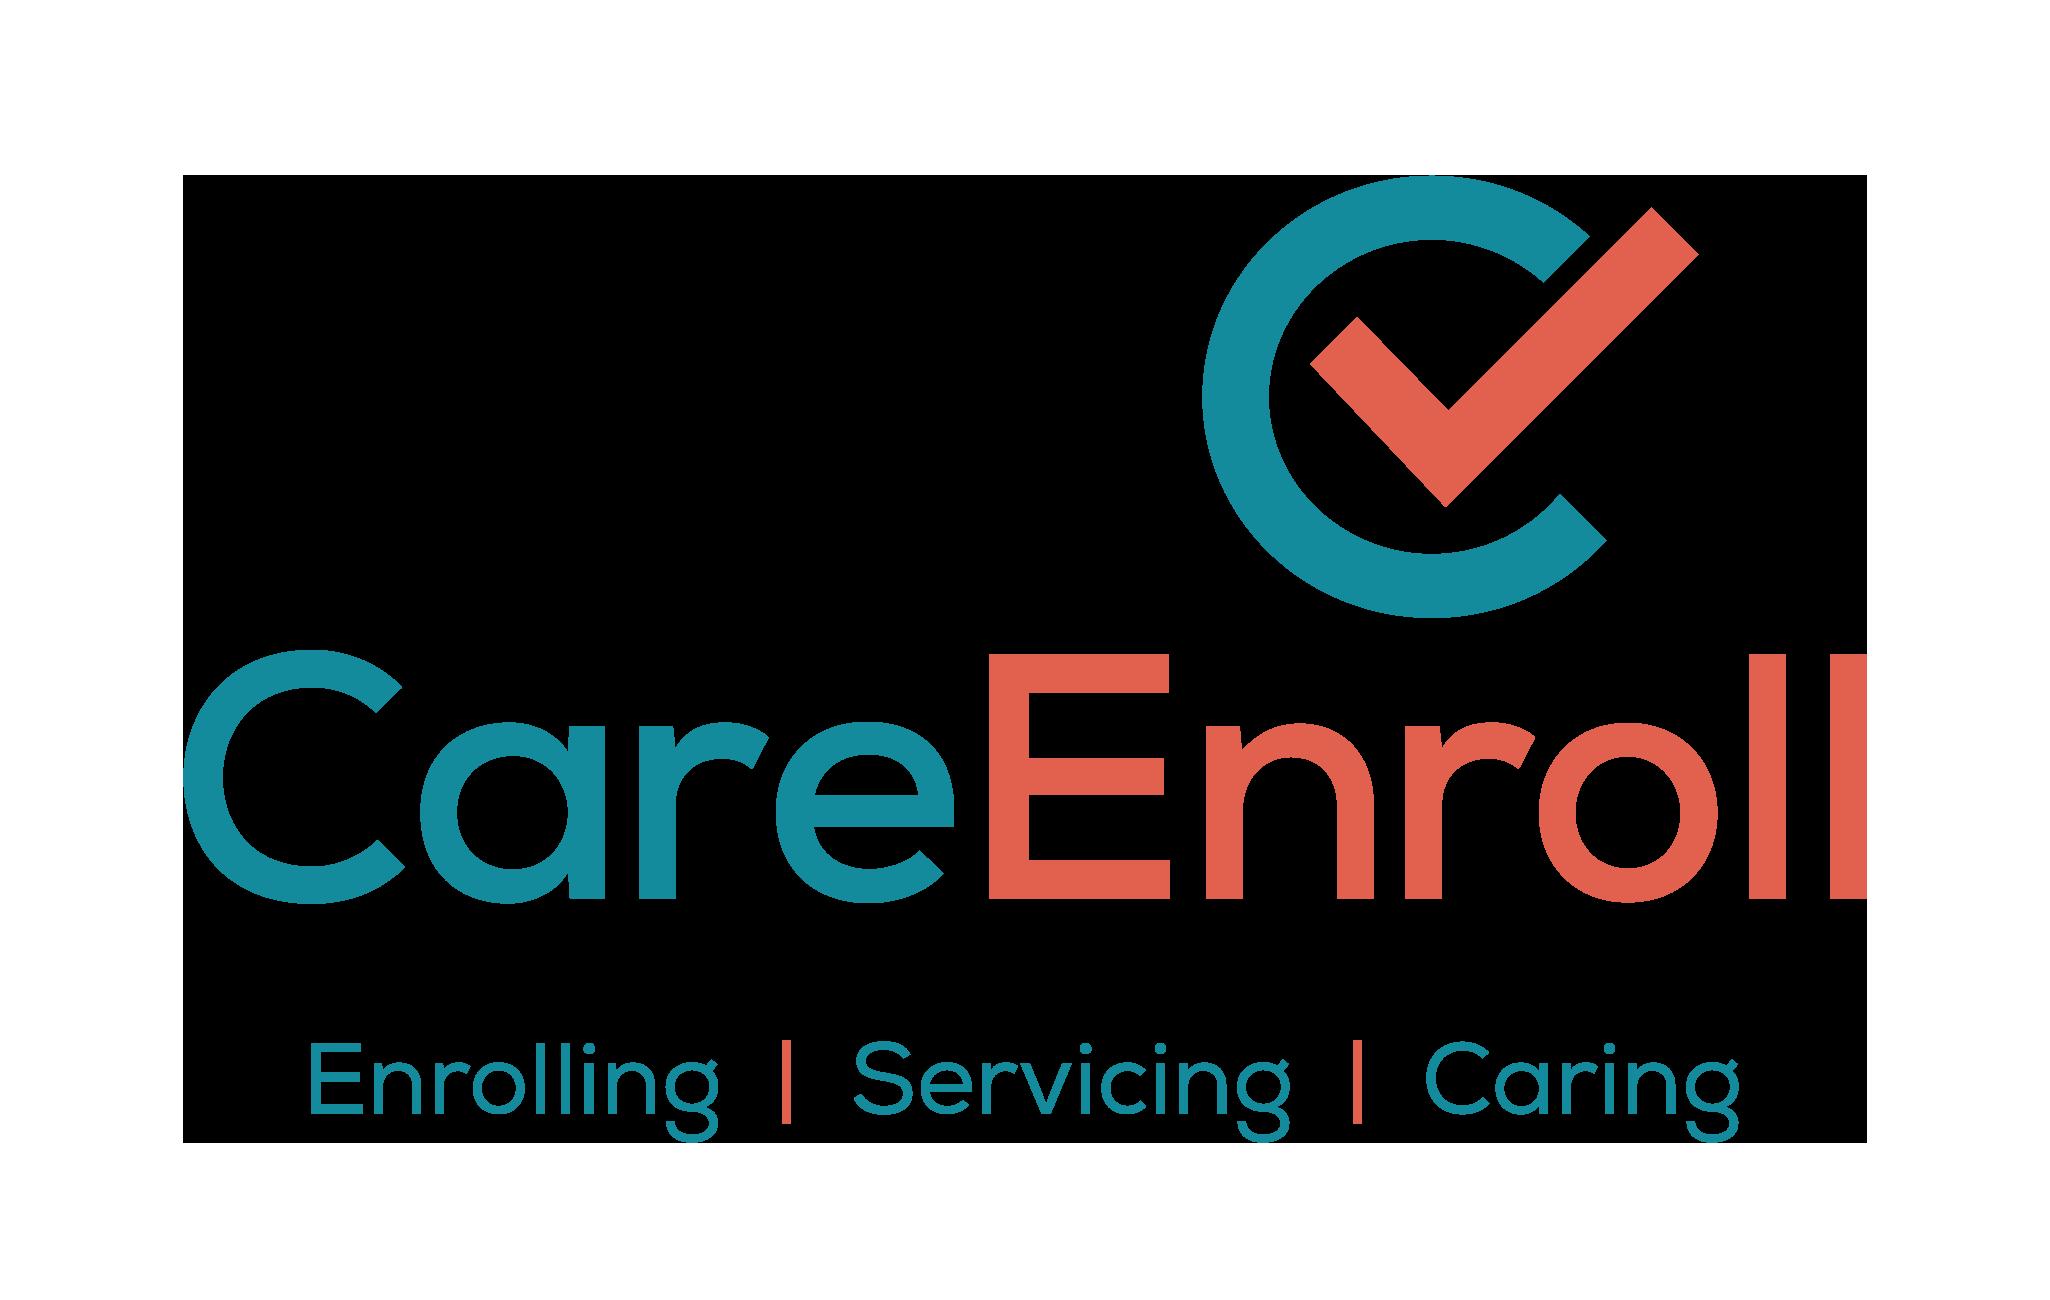 CareEnroll